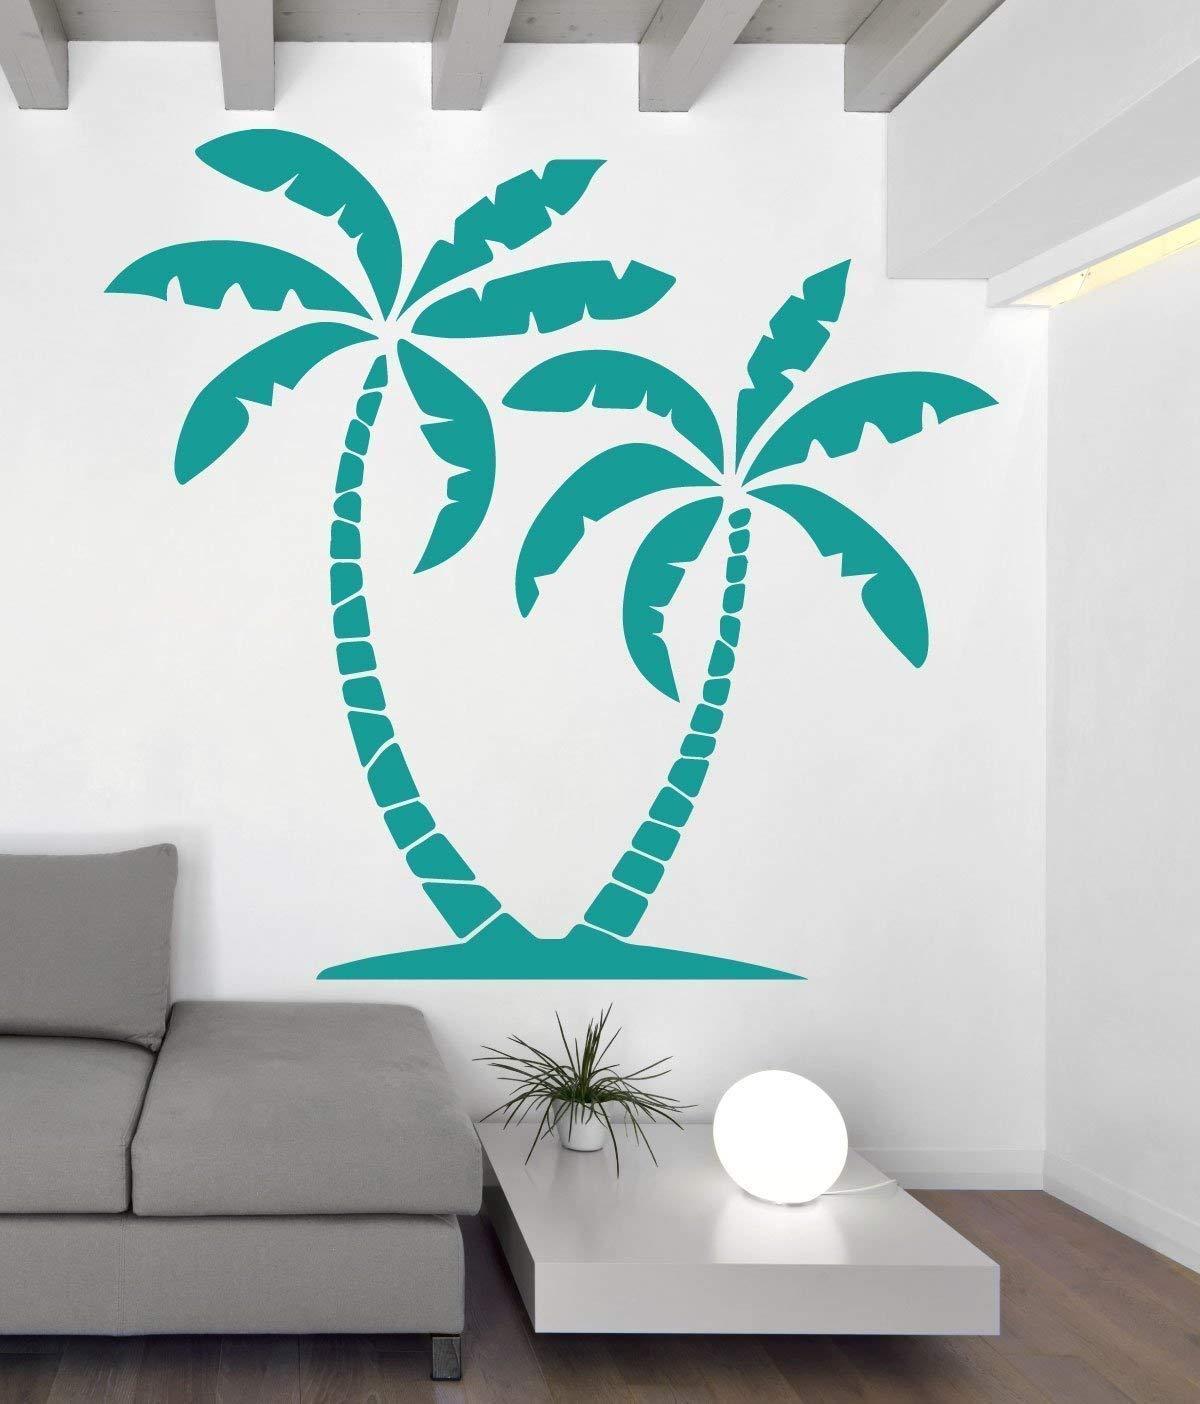 Home Decor Office Decor Garden Design Hawaiian Decor Beach Decal Bedroom Decal Travel Design Palm Tree Vinyl Decal size LARGE